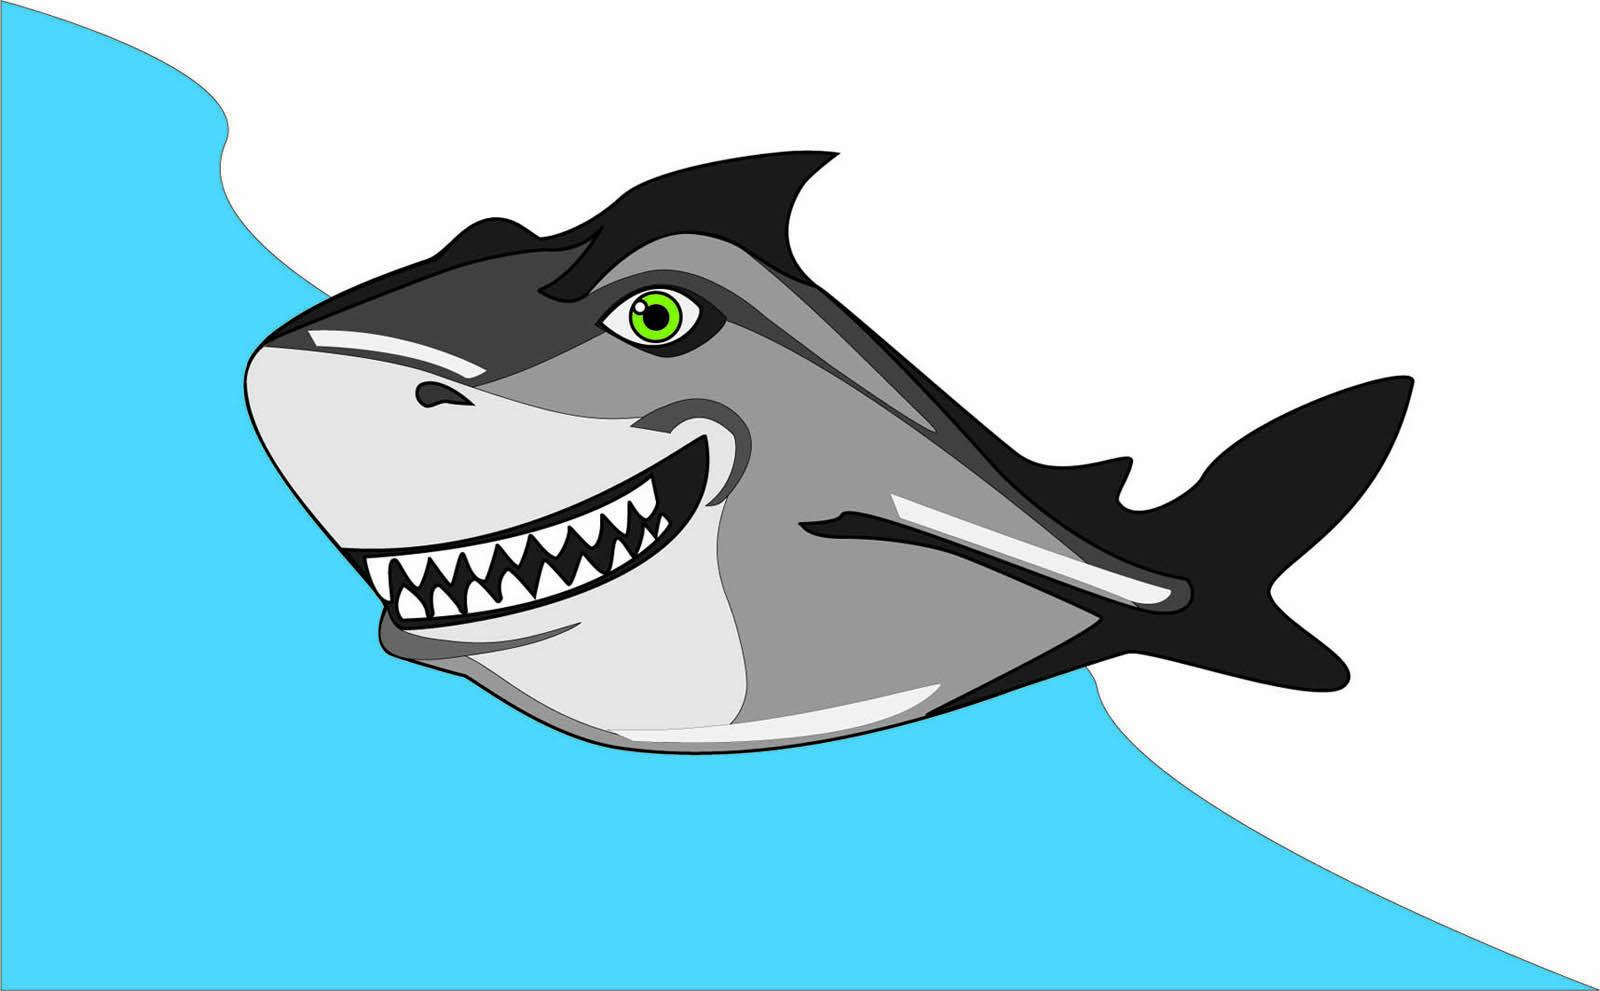 Анимационная картинка акулы